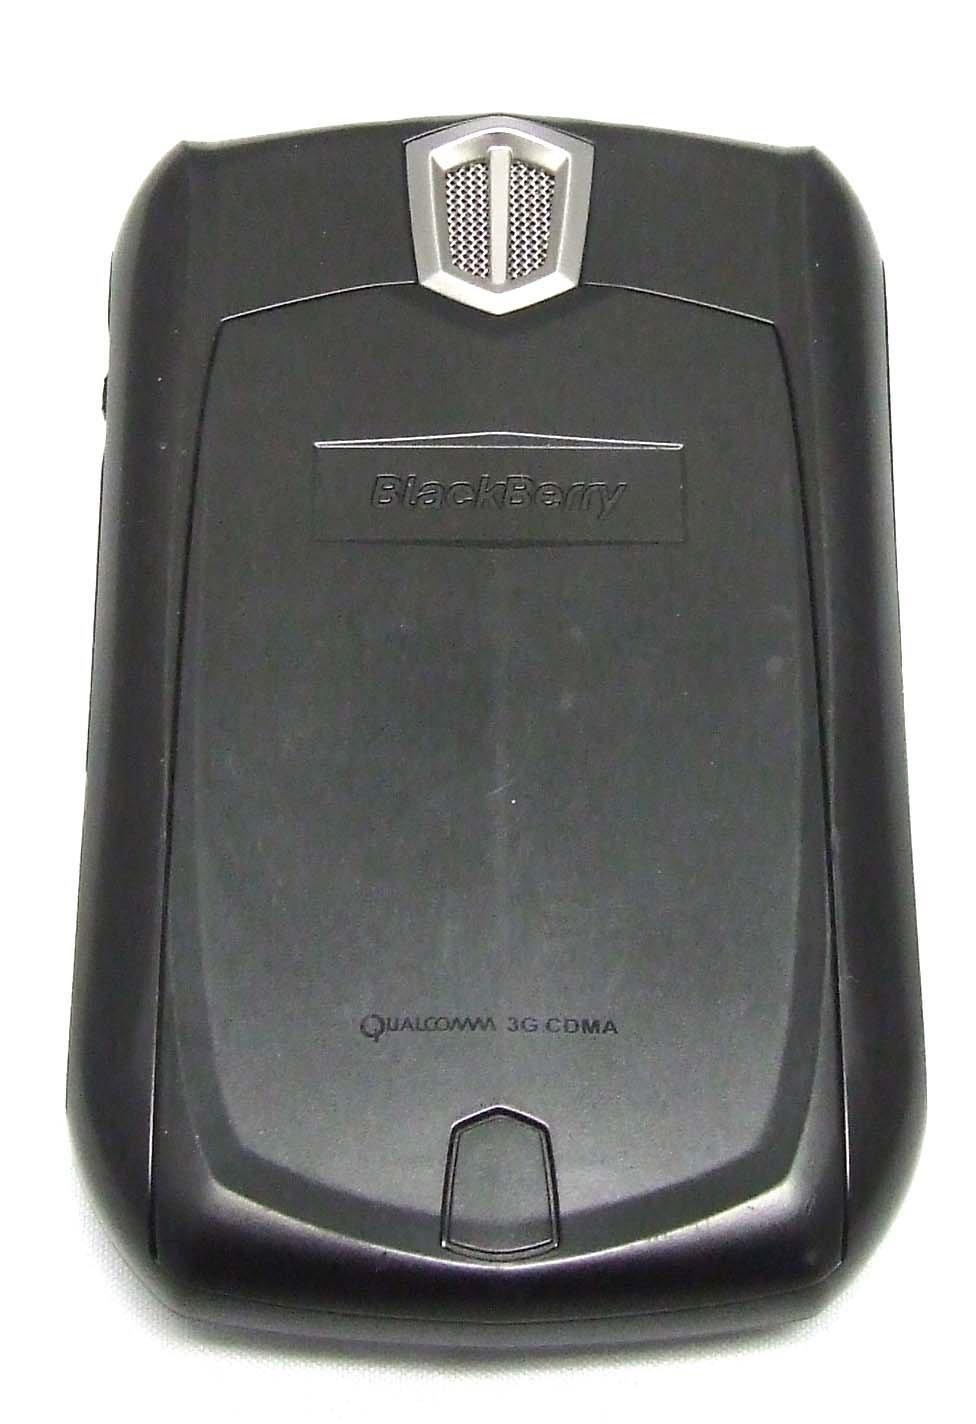 amazon com blackberry 8703e phone sprint pcs electronics rh amazon com BlackBerry Classic BlackBerry Curve 8900